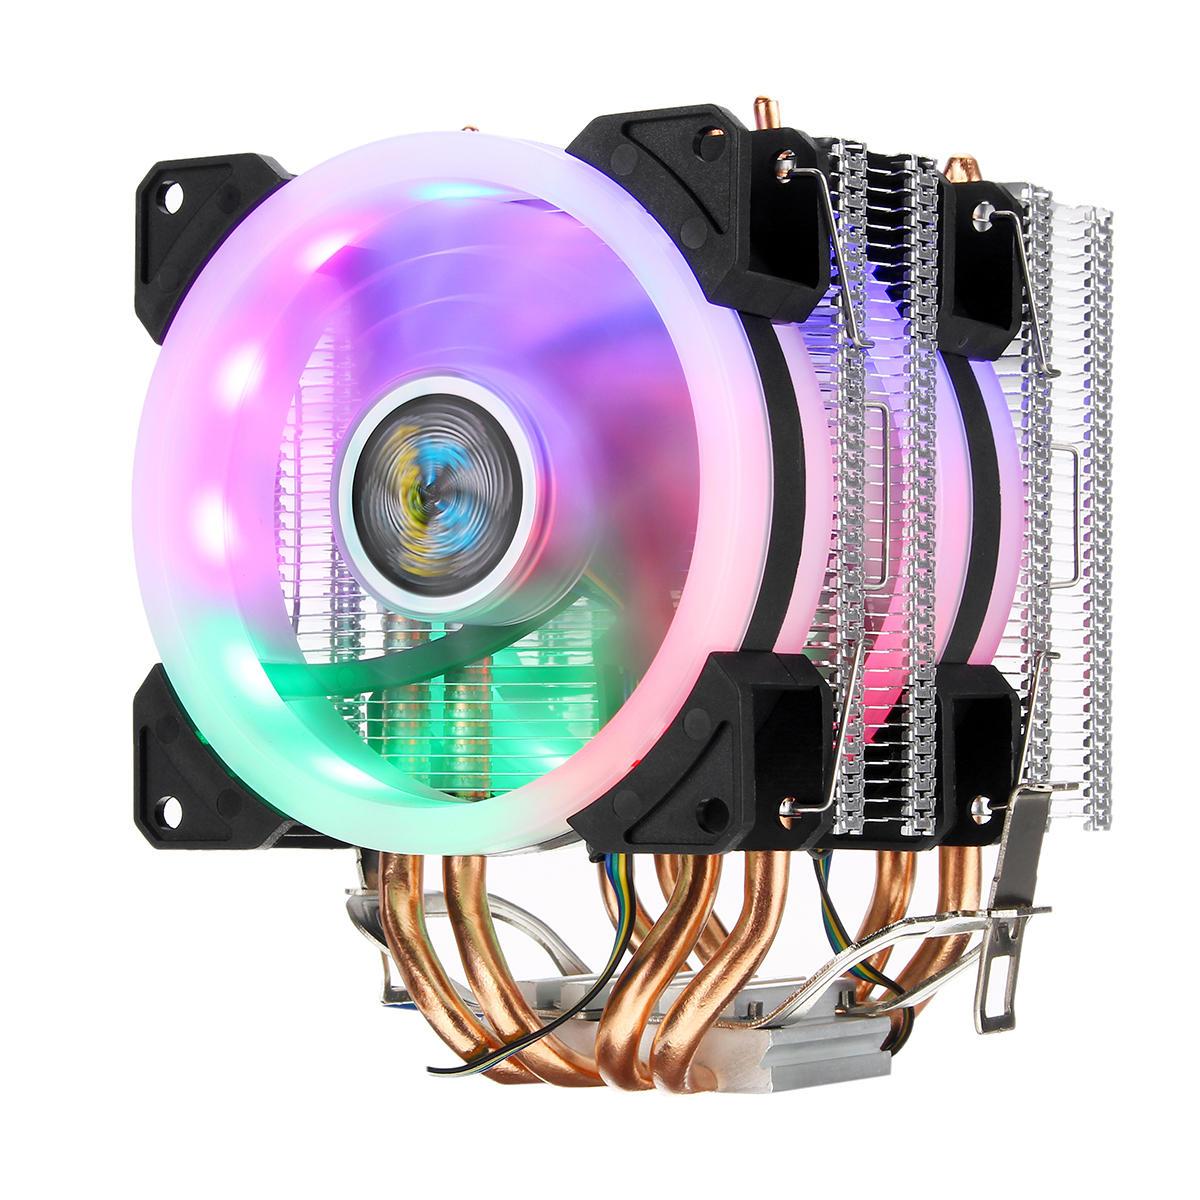 Cooling Fan Three CPU Cooler Dual Fan Heatsink for Intel AMD AM2//AM2 //AM3 ED